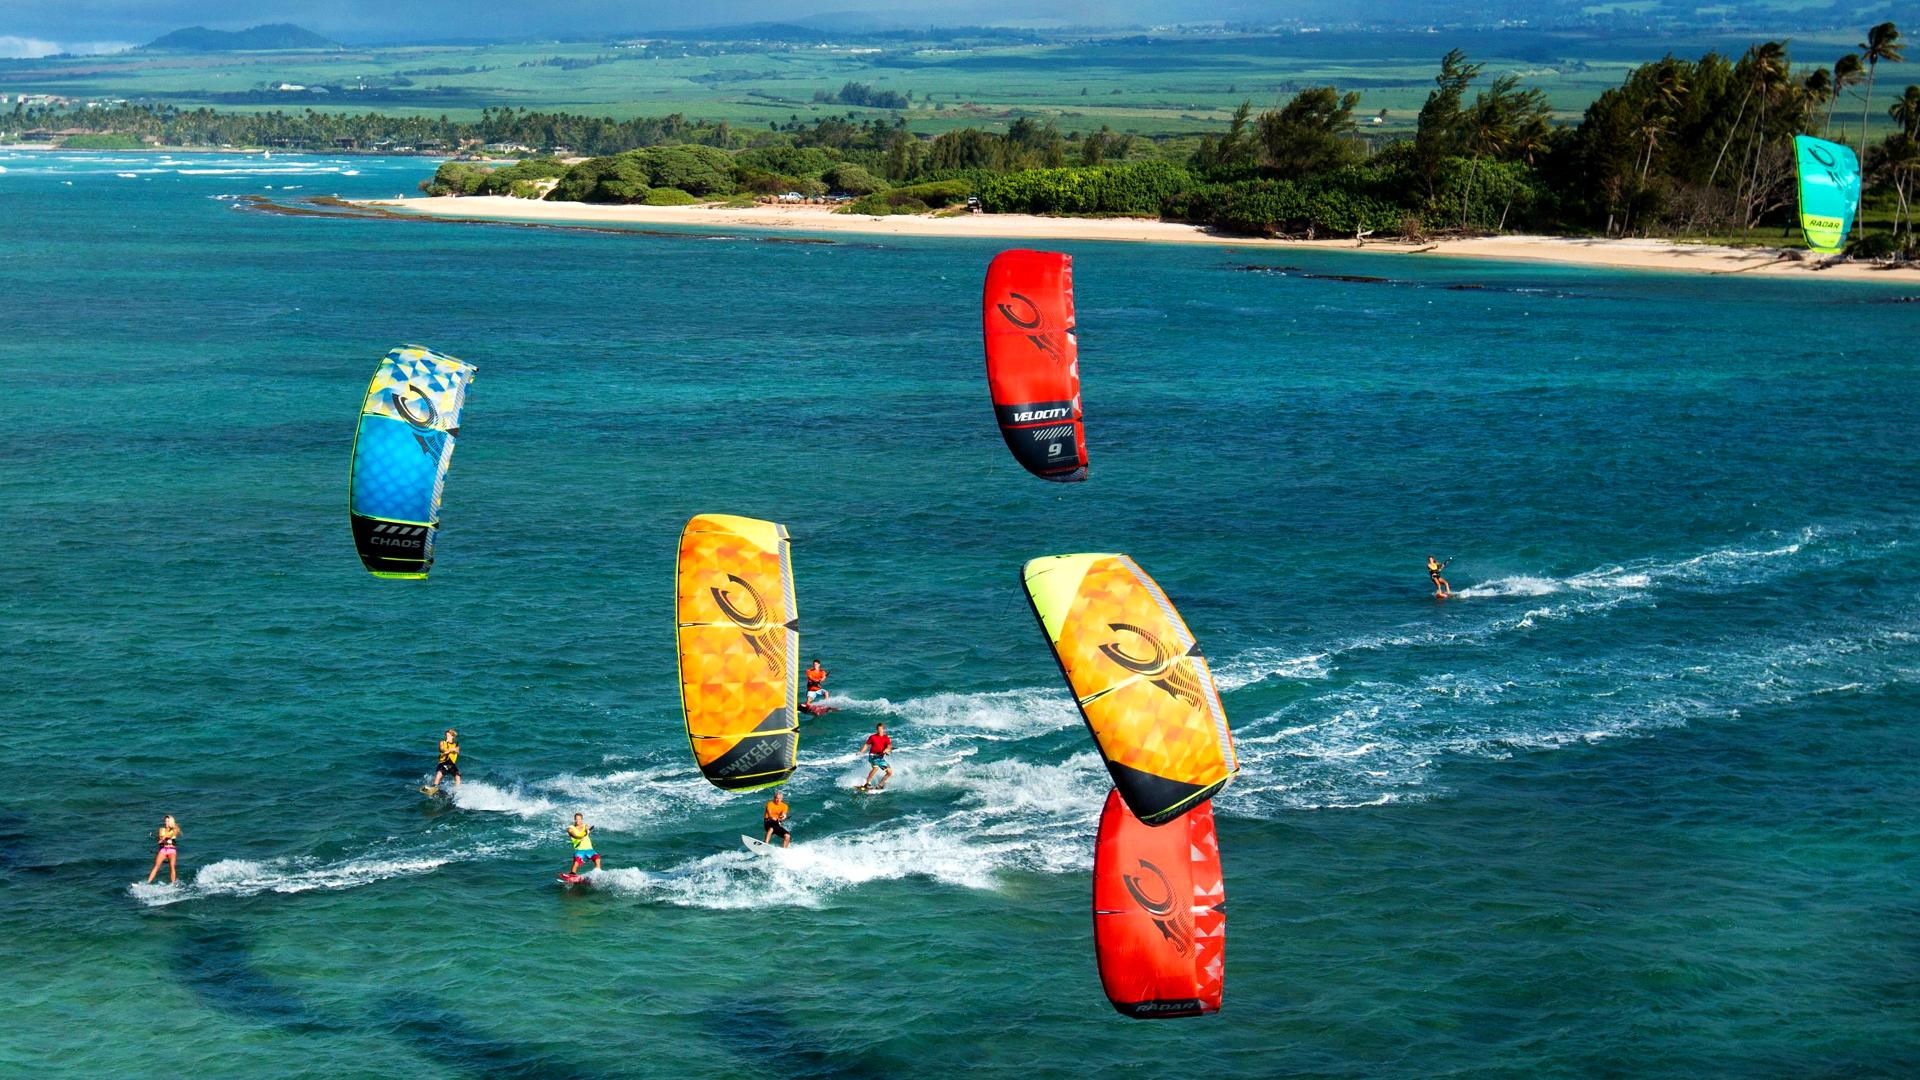 kitesurf wallpaper image - The 2015 Cabrinha Kites teamriders kitesurfing off the coast of Hawaii. - in resolution: High Definition - HD 16:9 1920 X 1080